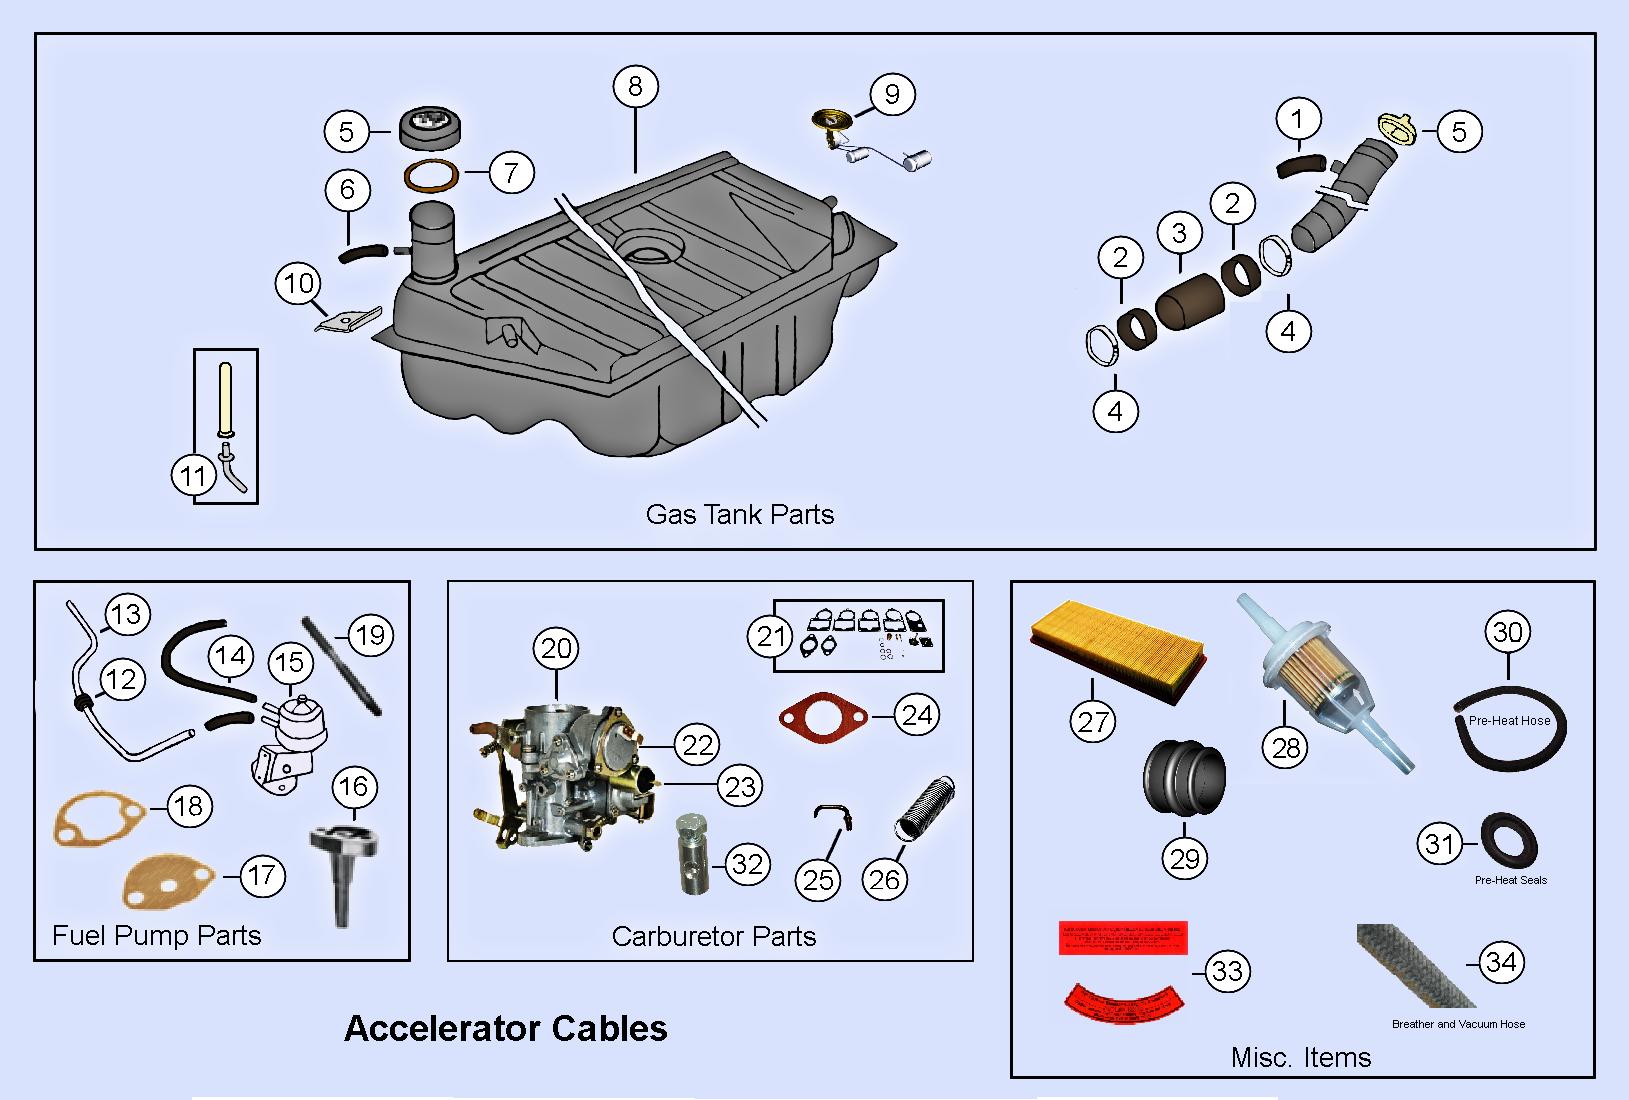 Vw Bug Fuel Pump Diagram Manual Of Wiring Ugl 1200 Maglock System Pedals Pinterest Beetles And Volkswagen Rh Com Beetle